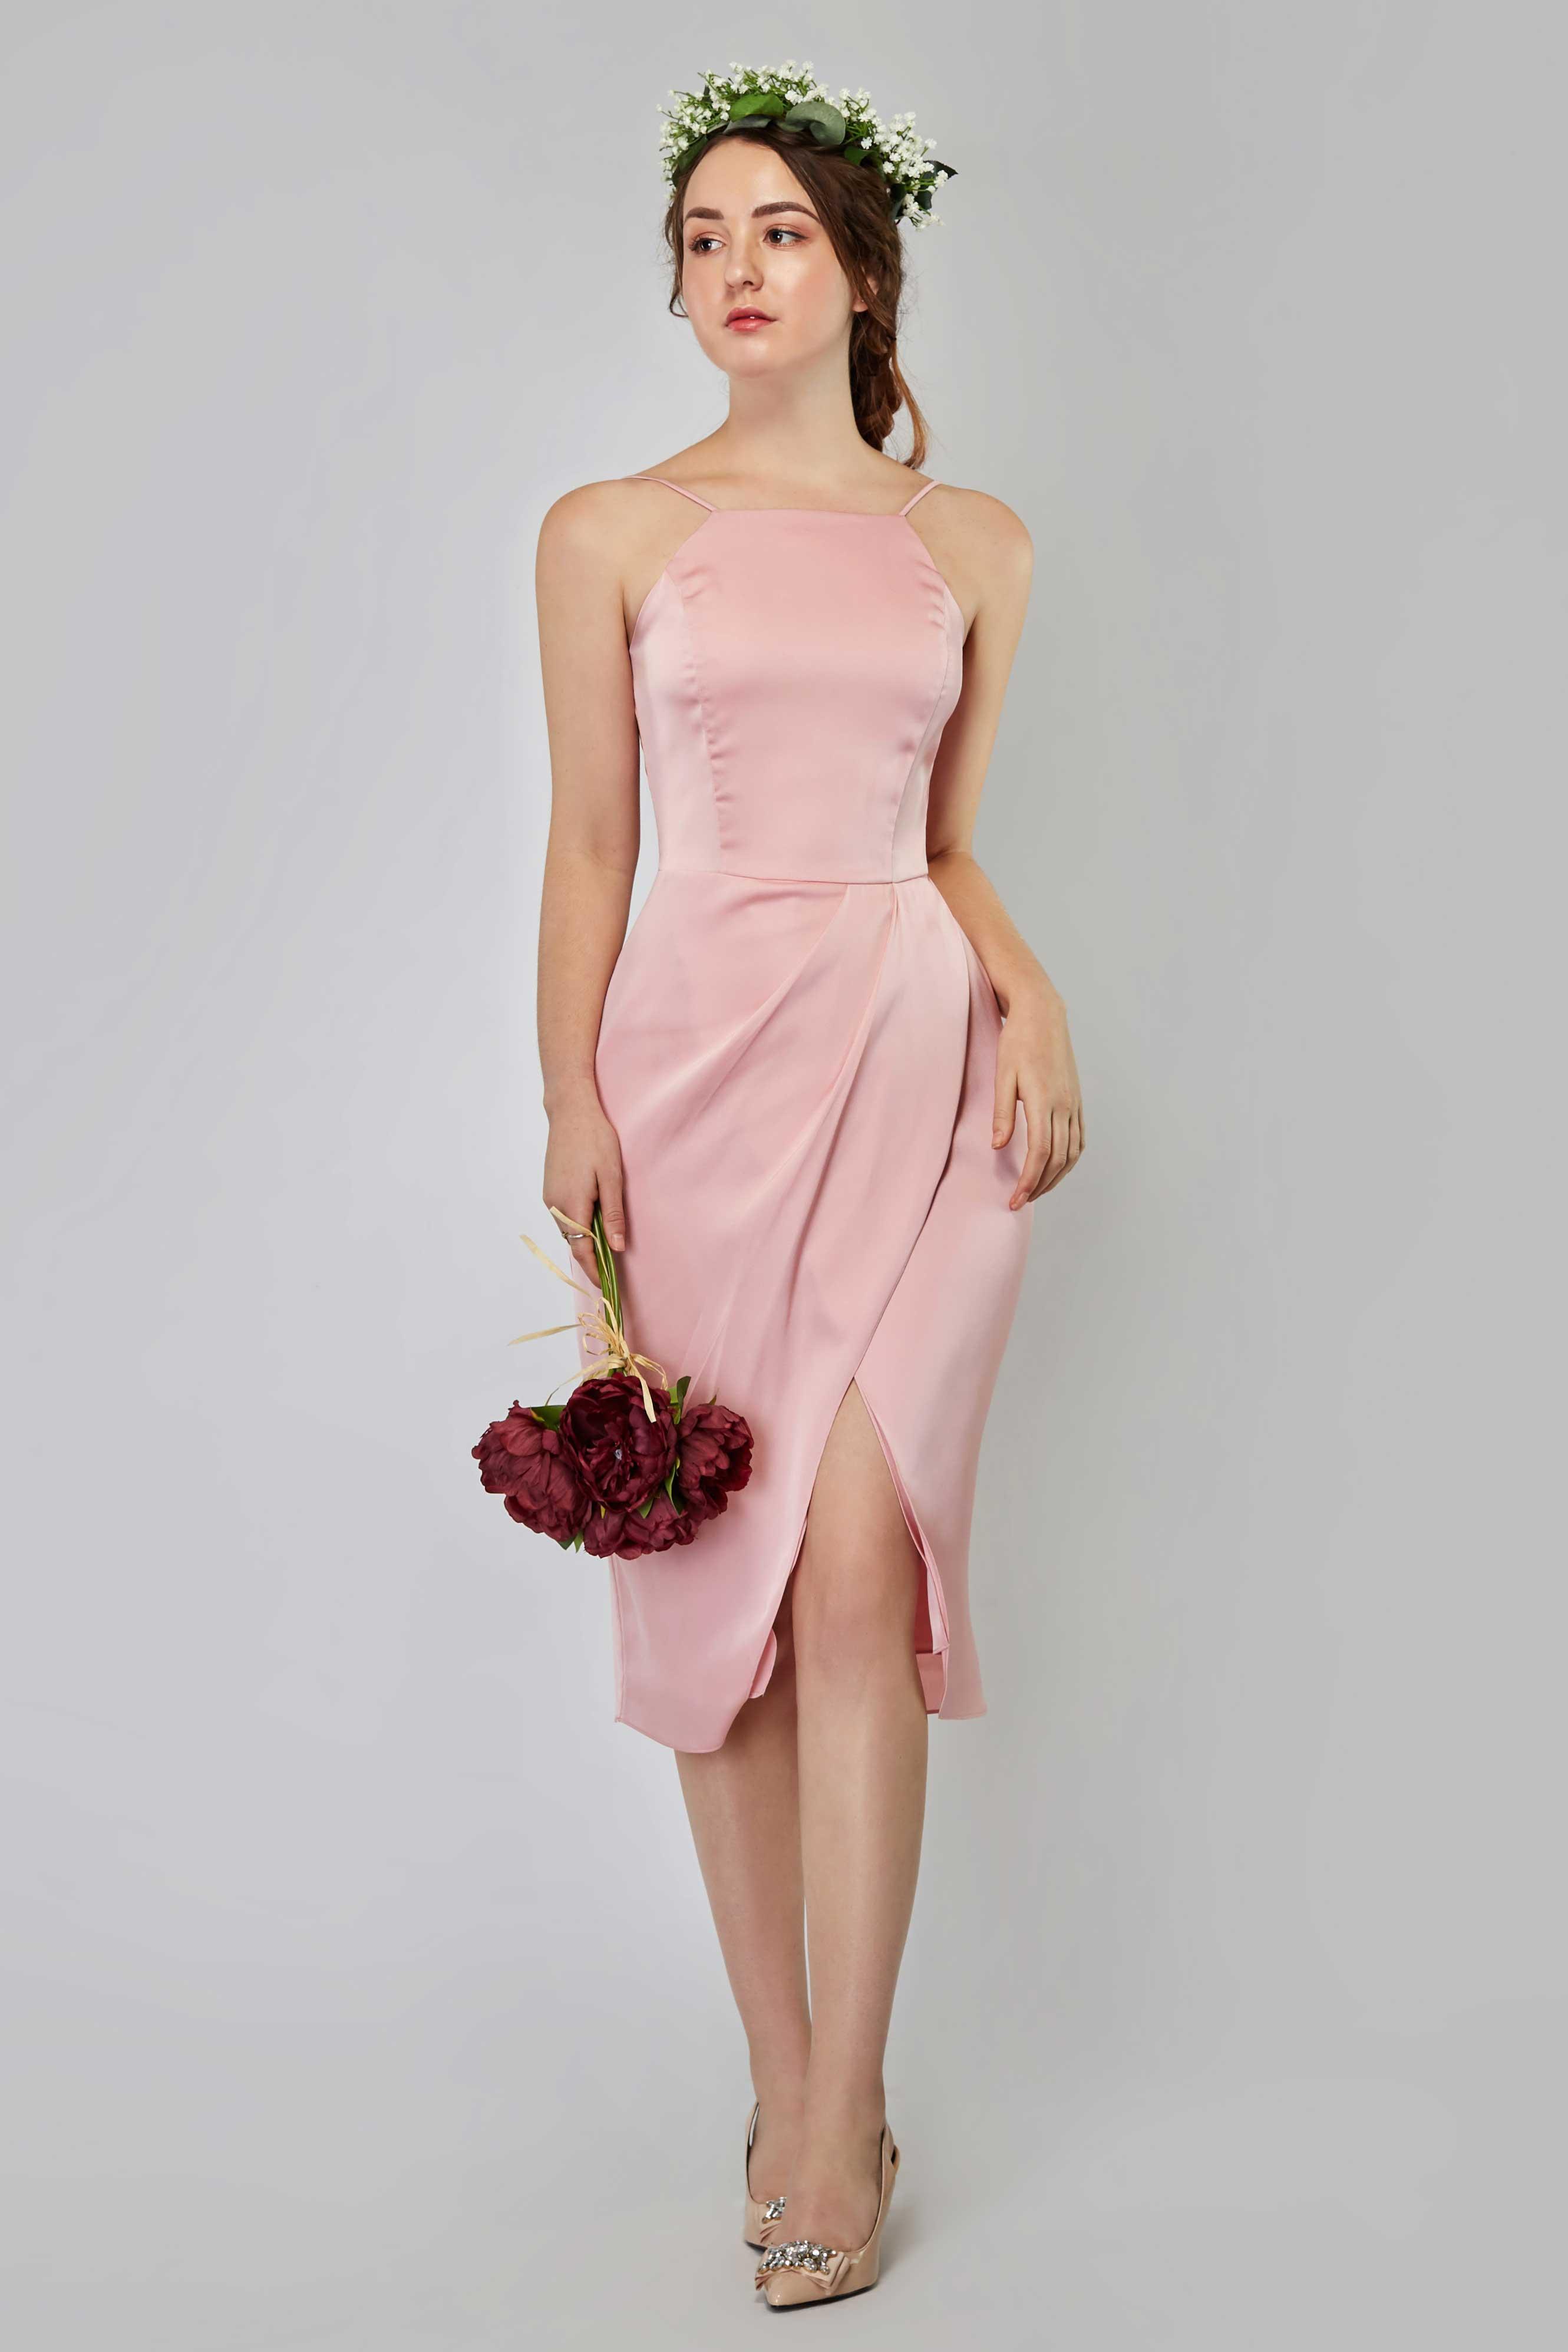 7021d5e5da2a Missha Satin Halter Midi Dress in Baby Blush - Baby s Breath Bridesmaids